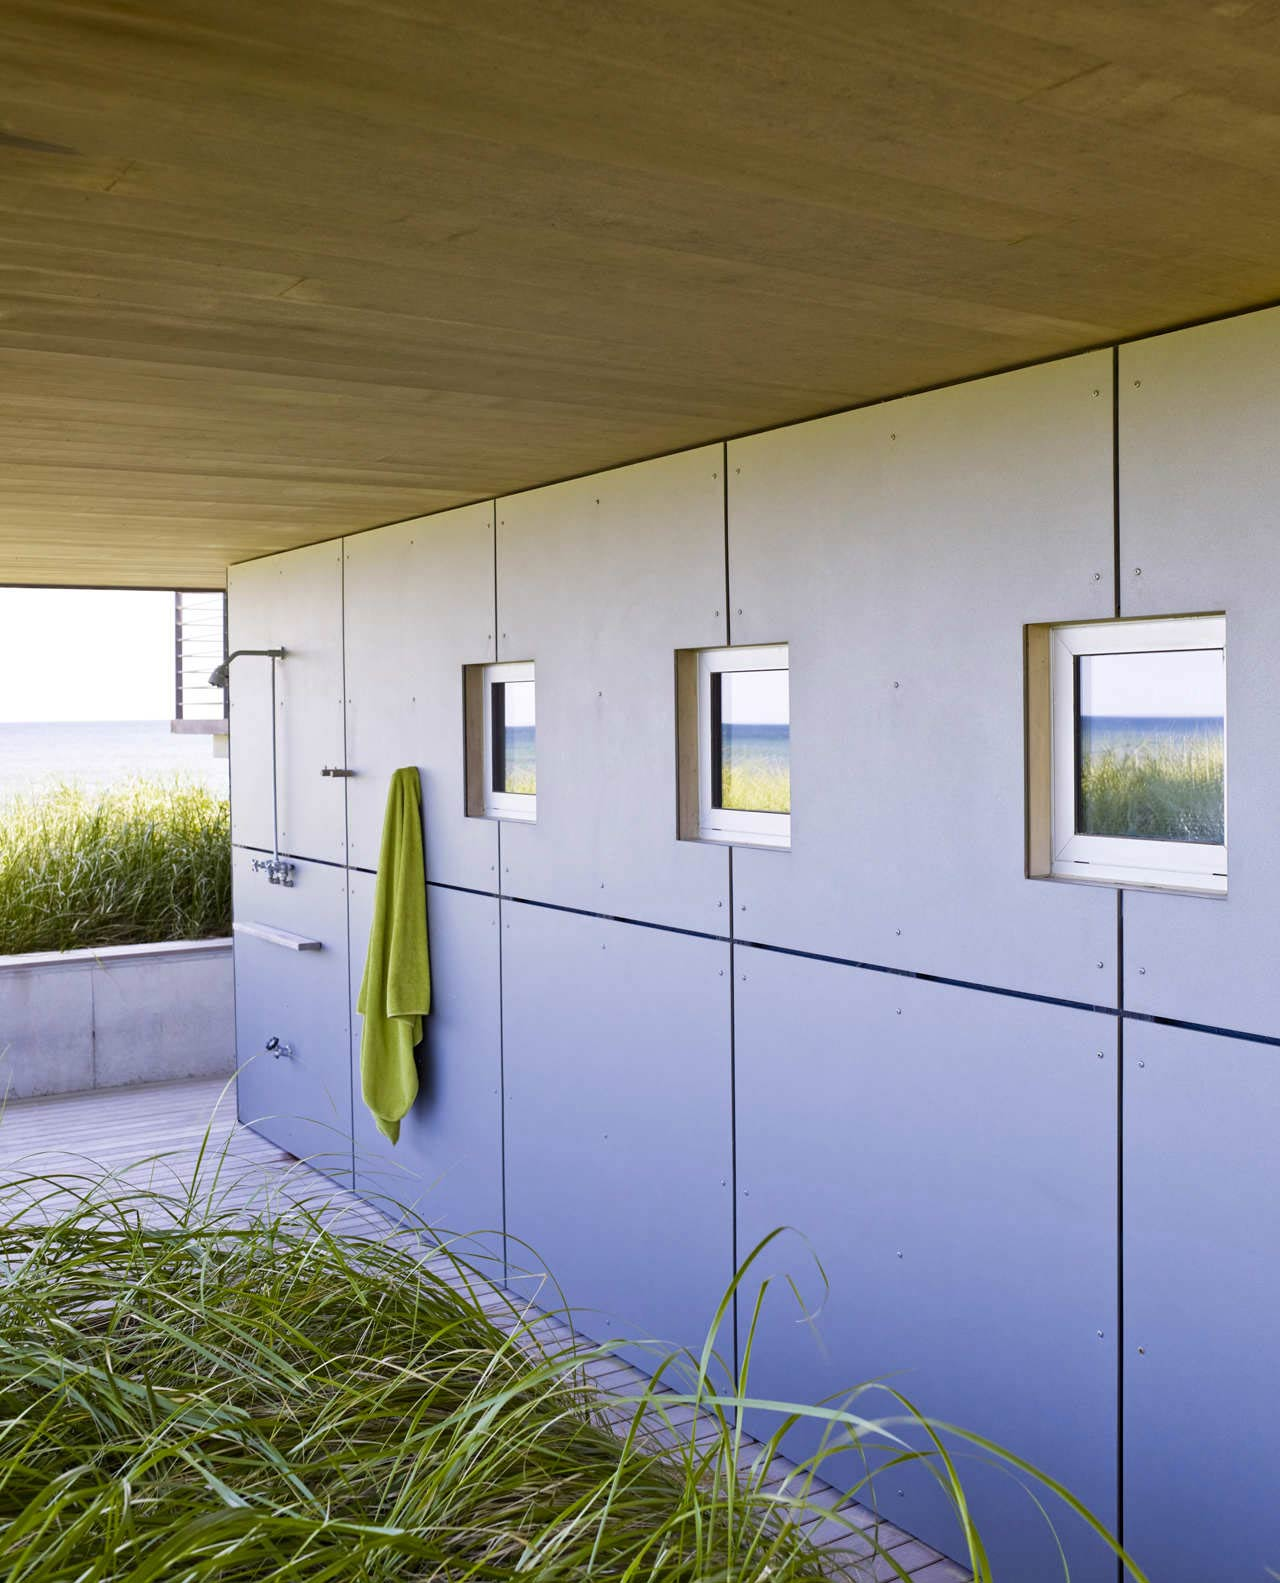 Outdoor Shower, Surfside House in Bridgehampton, New York by Stelle Architects